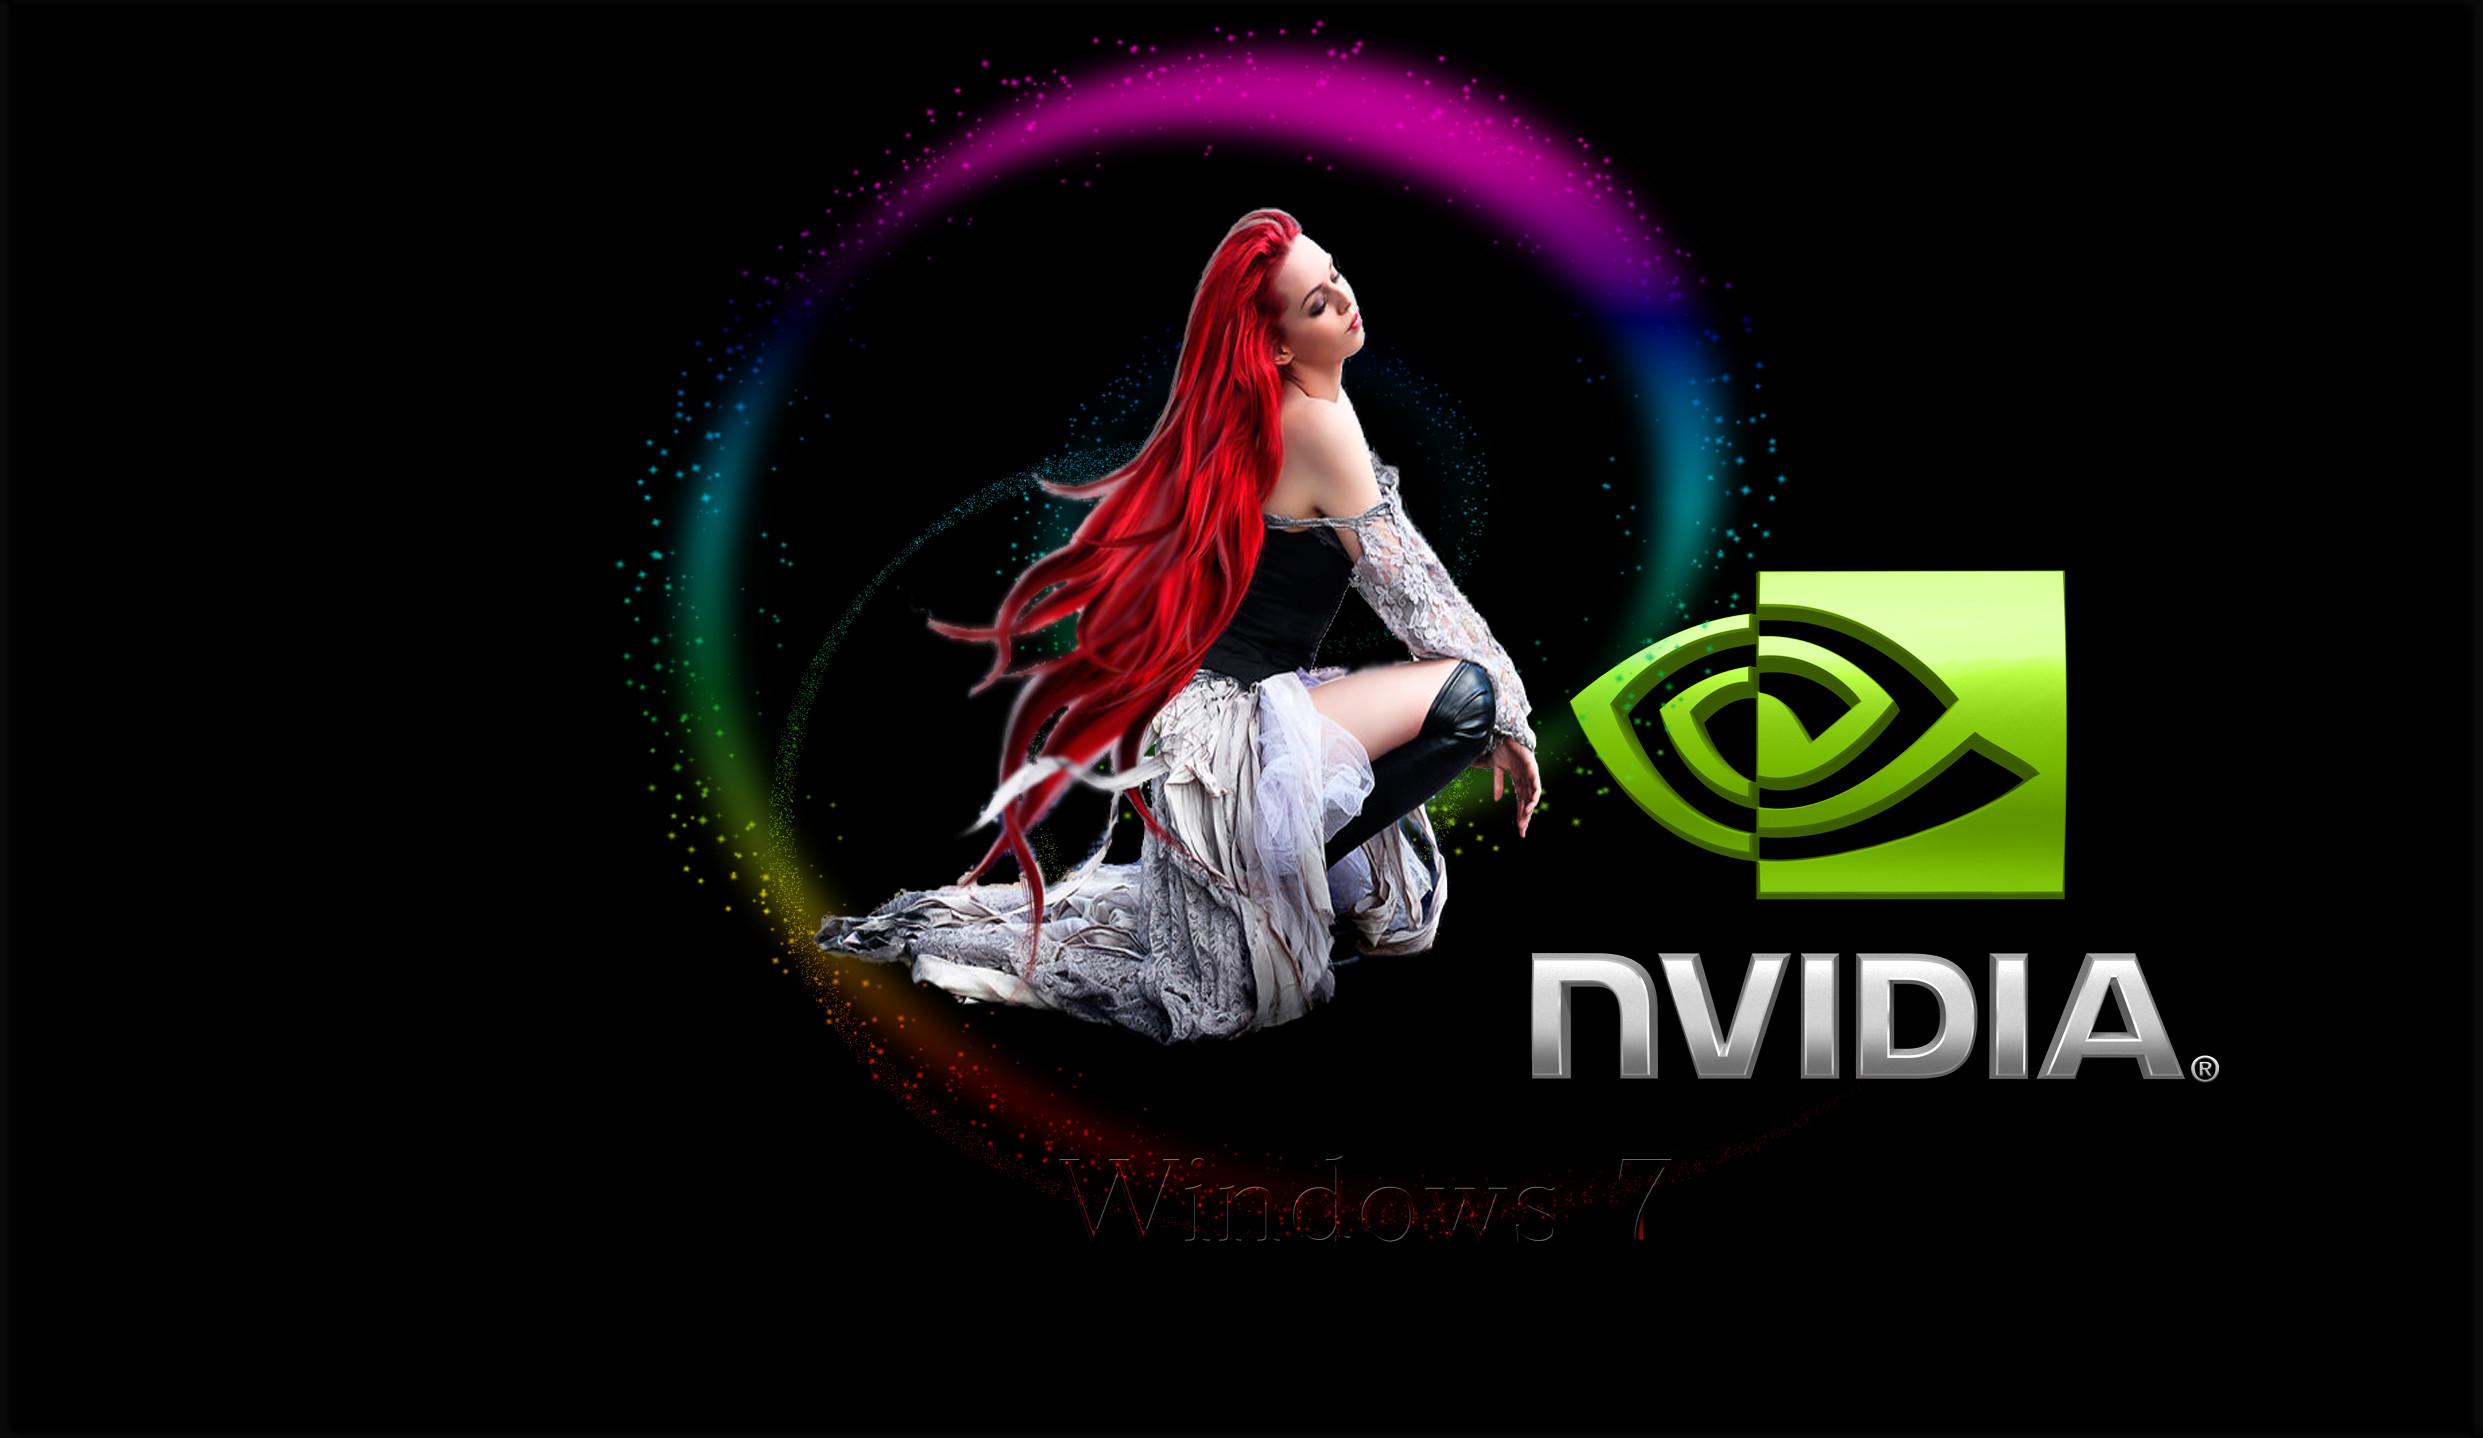 Win 7 Nvidia Wallpaper by kubines on DeviantArt